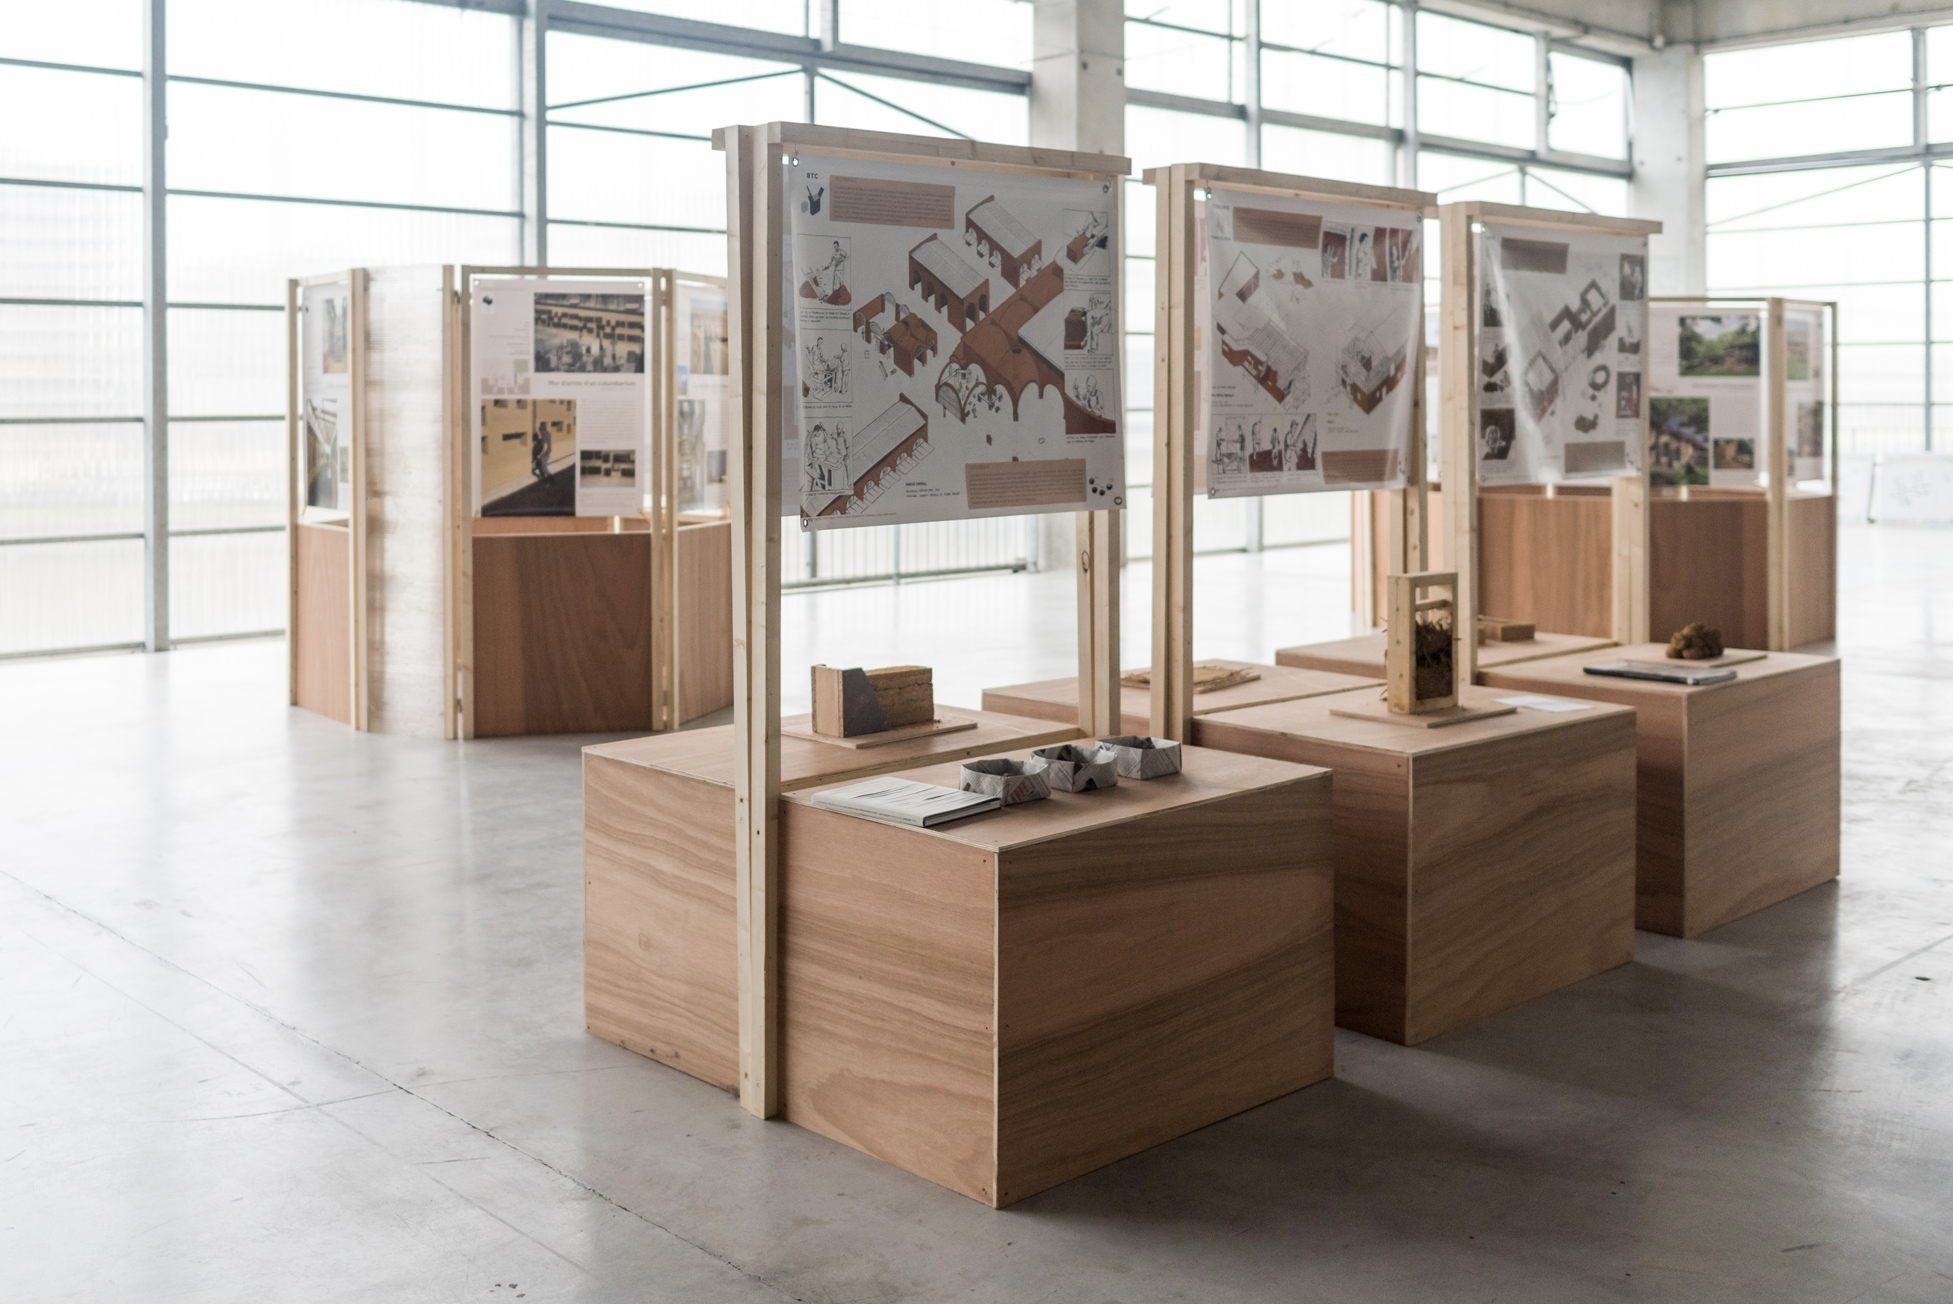 D Exhibition : Travelling exhibition terra award